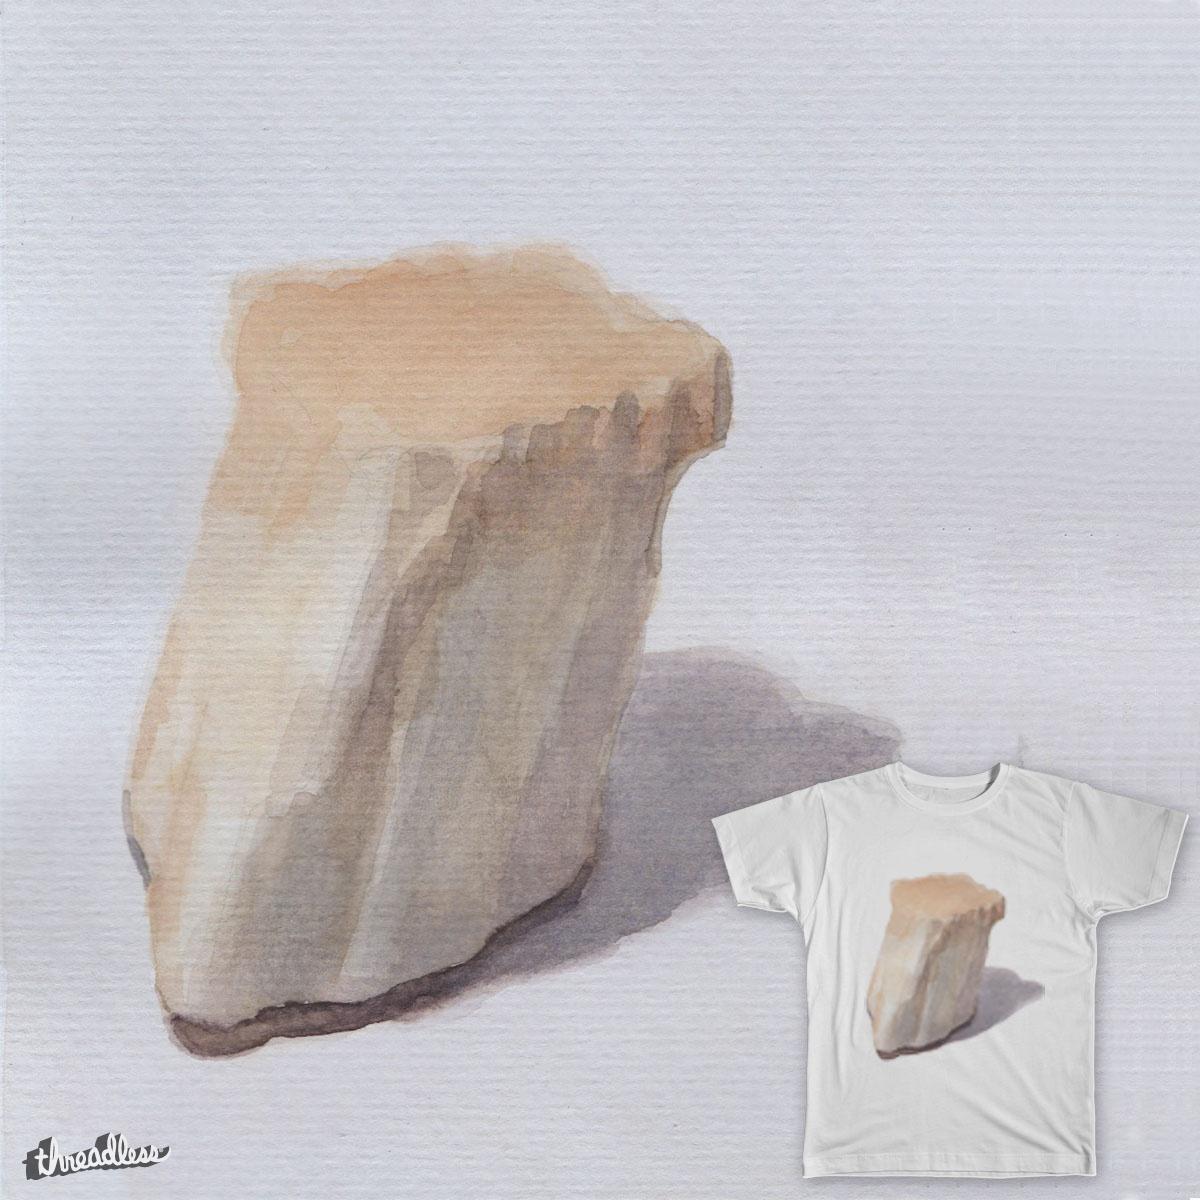 watercolor stone by brochagorda on Threadless